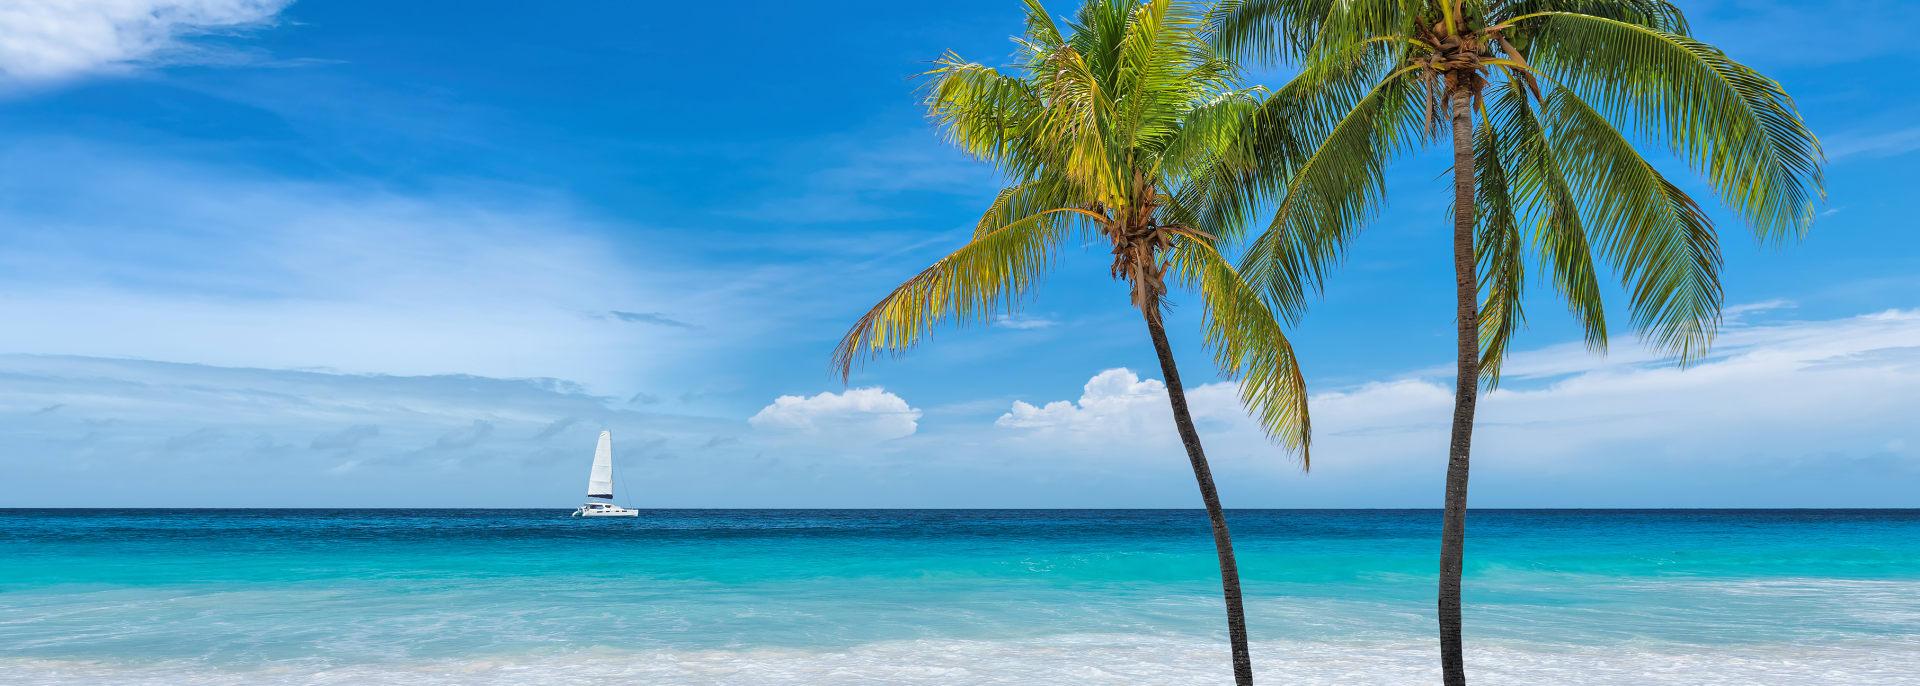 Segelkreuzfahrten, Karibik